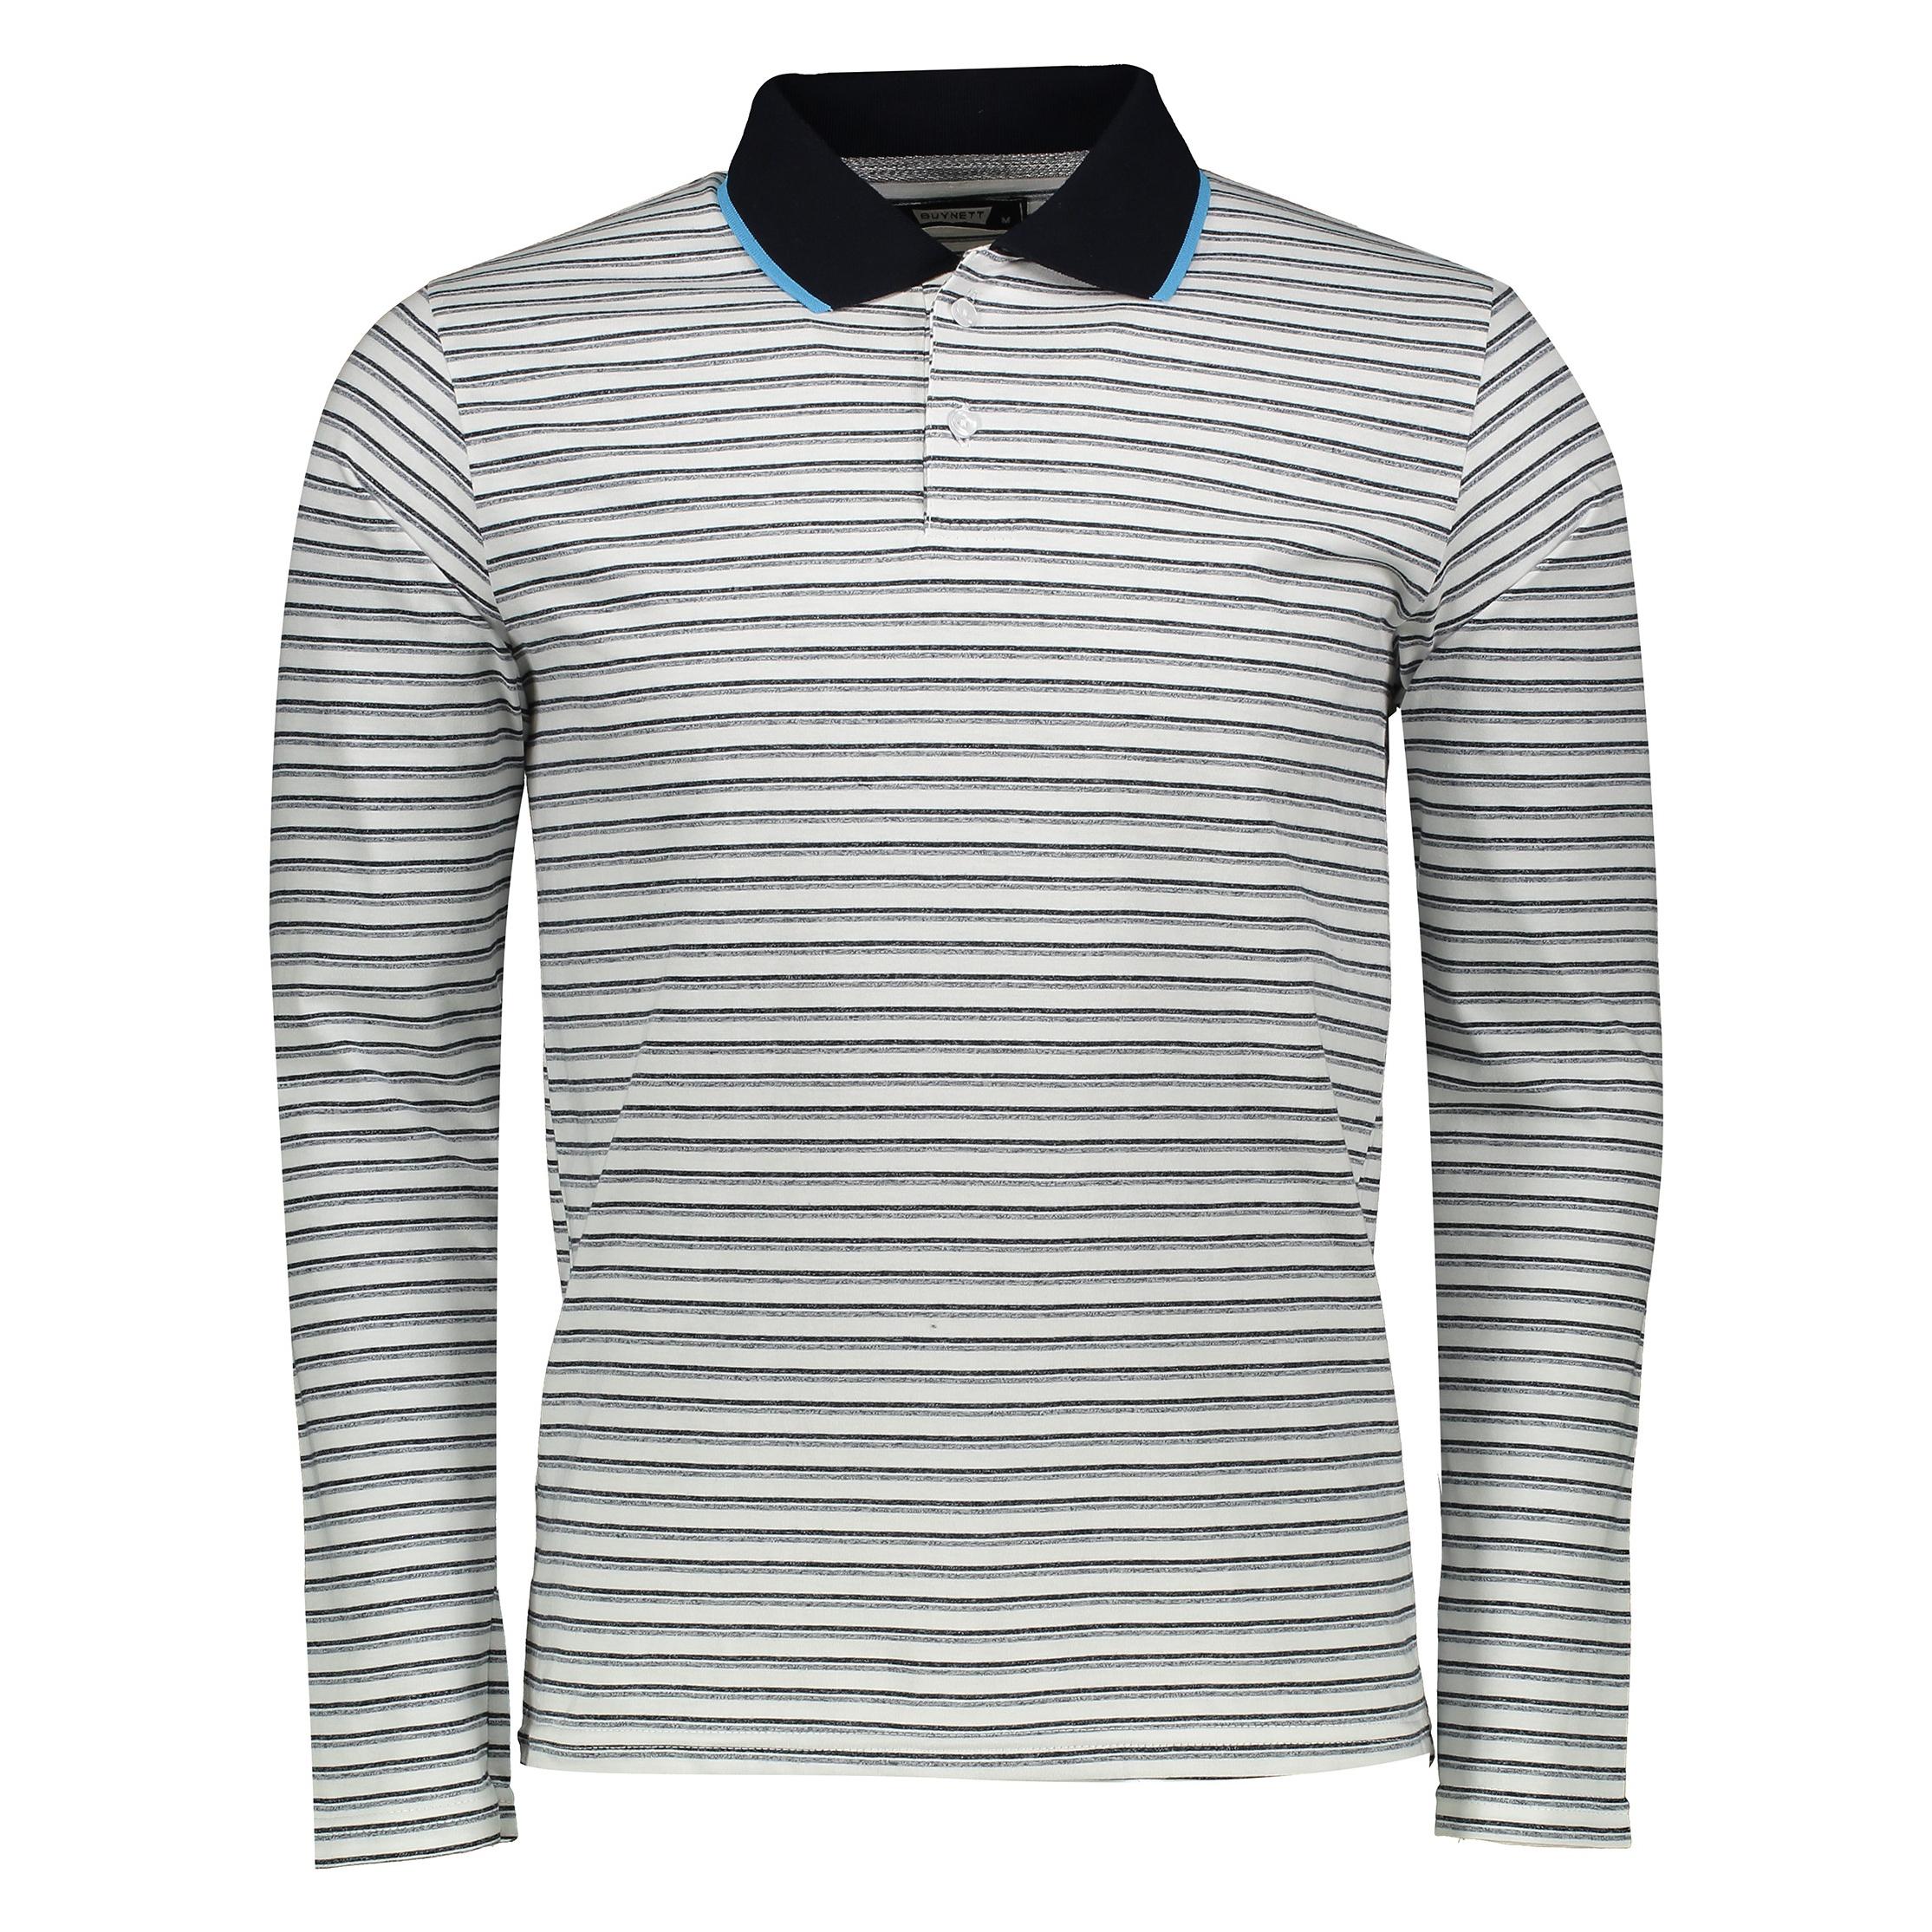 پولو شرت آستین بلند مردانه باینت کد 350-1